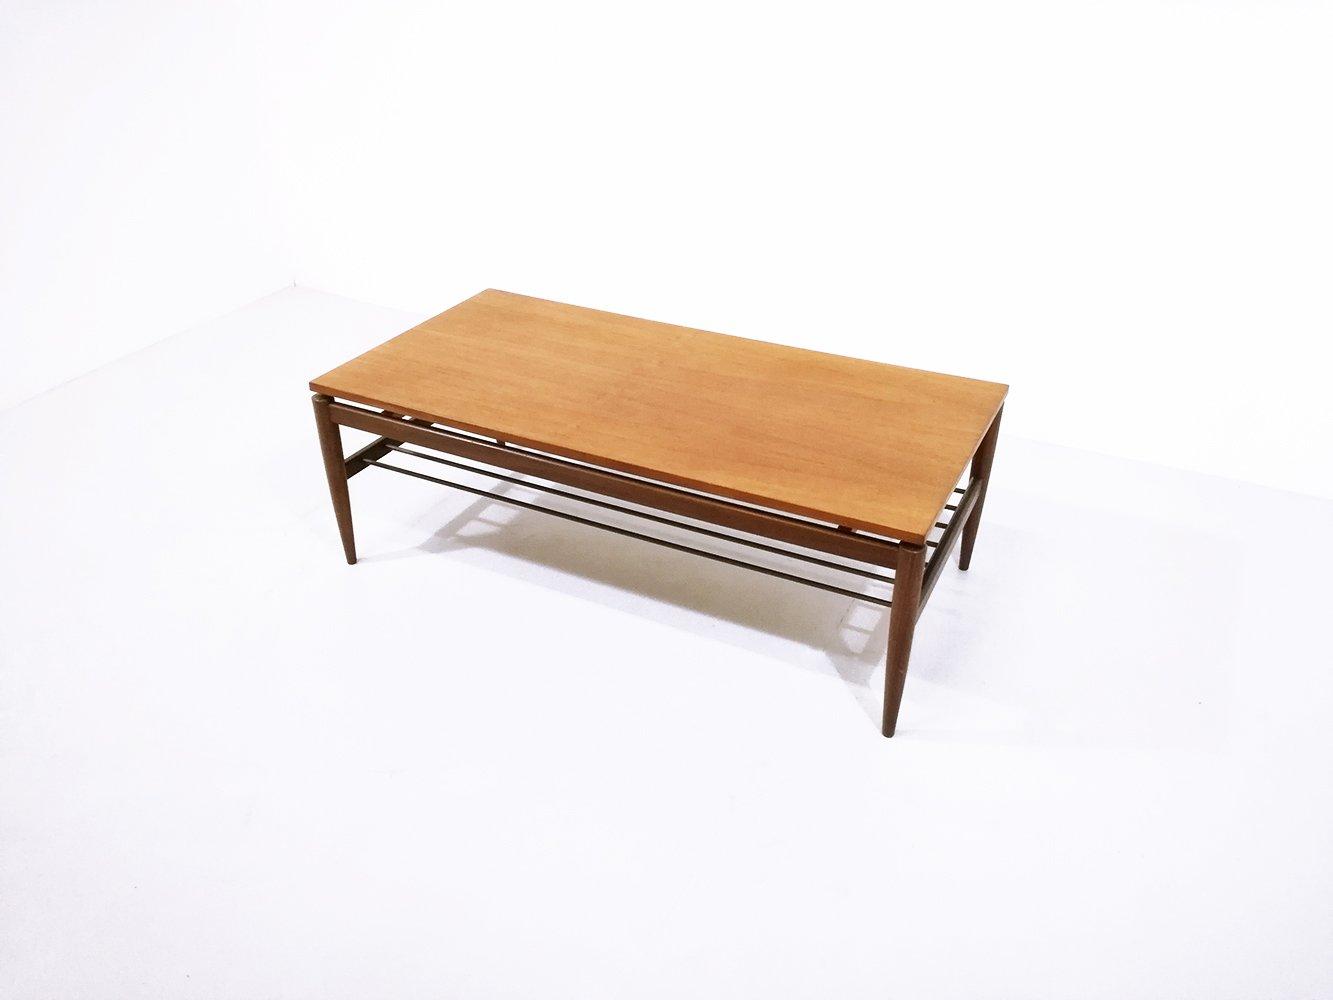 Vintage Scandinavian Teak Coffee Table 1960s For Sale At Pamono